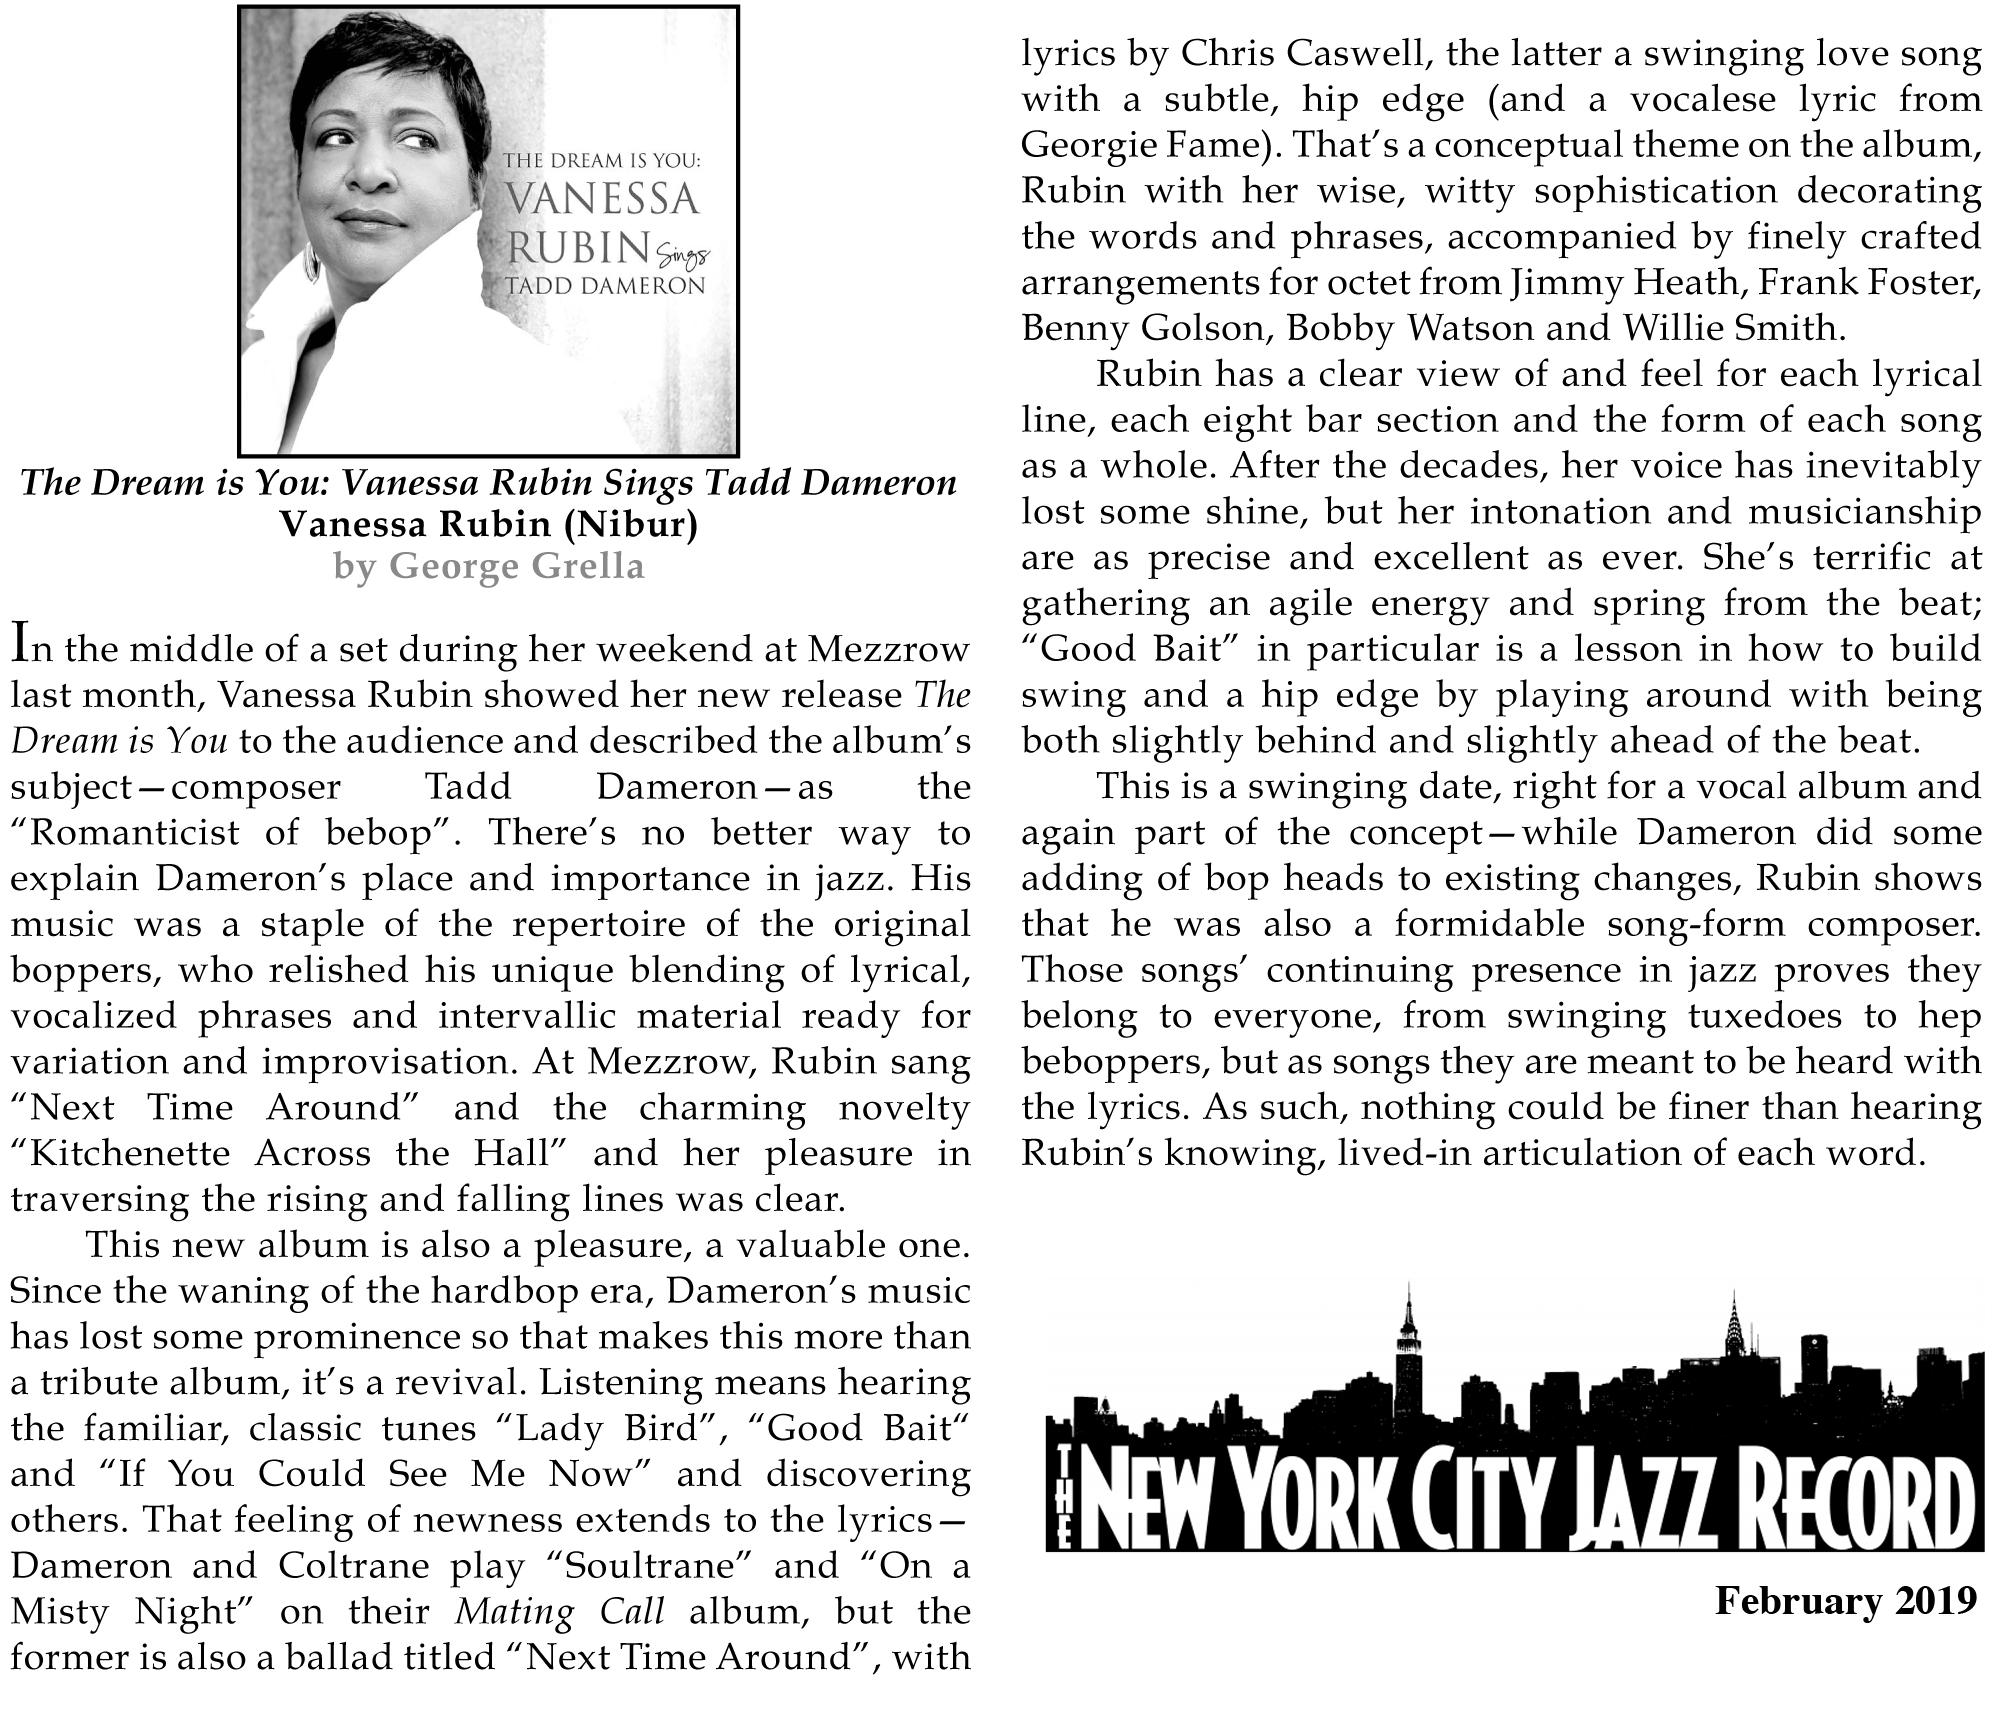 REVIEW: New York City Jazz Record Reviews Vanessa Rubin's